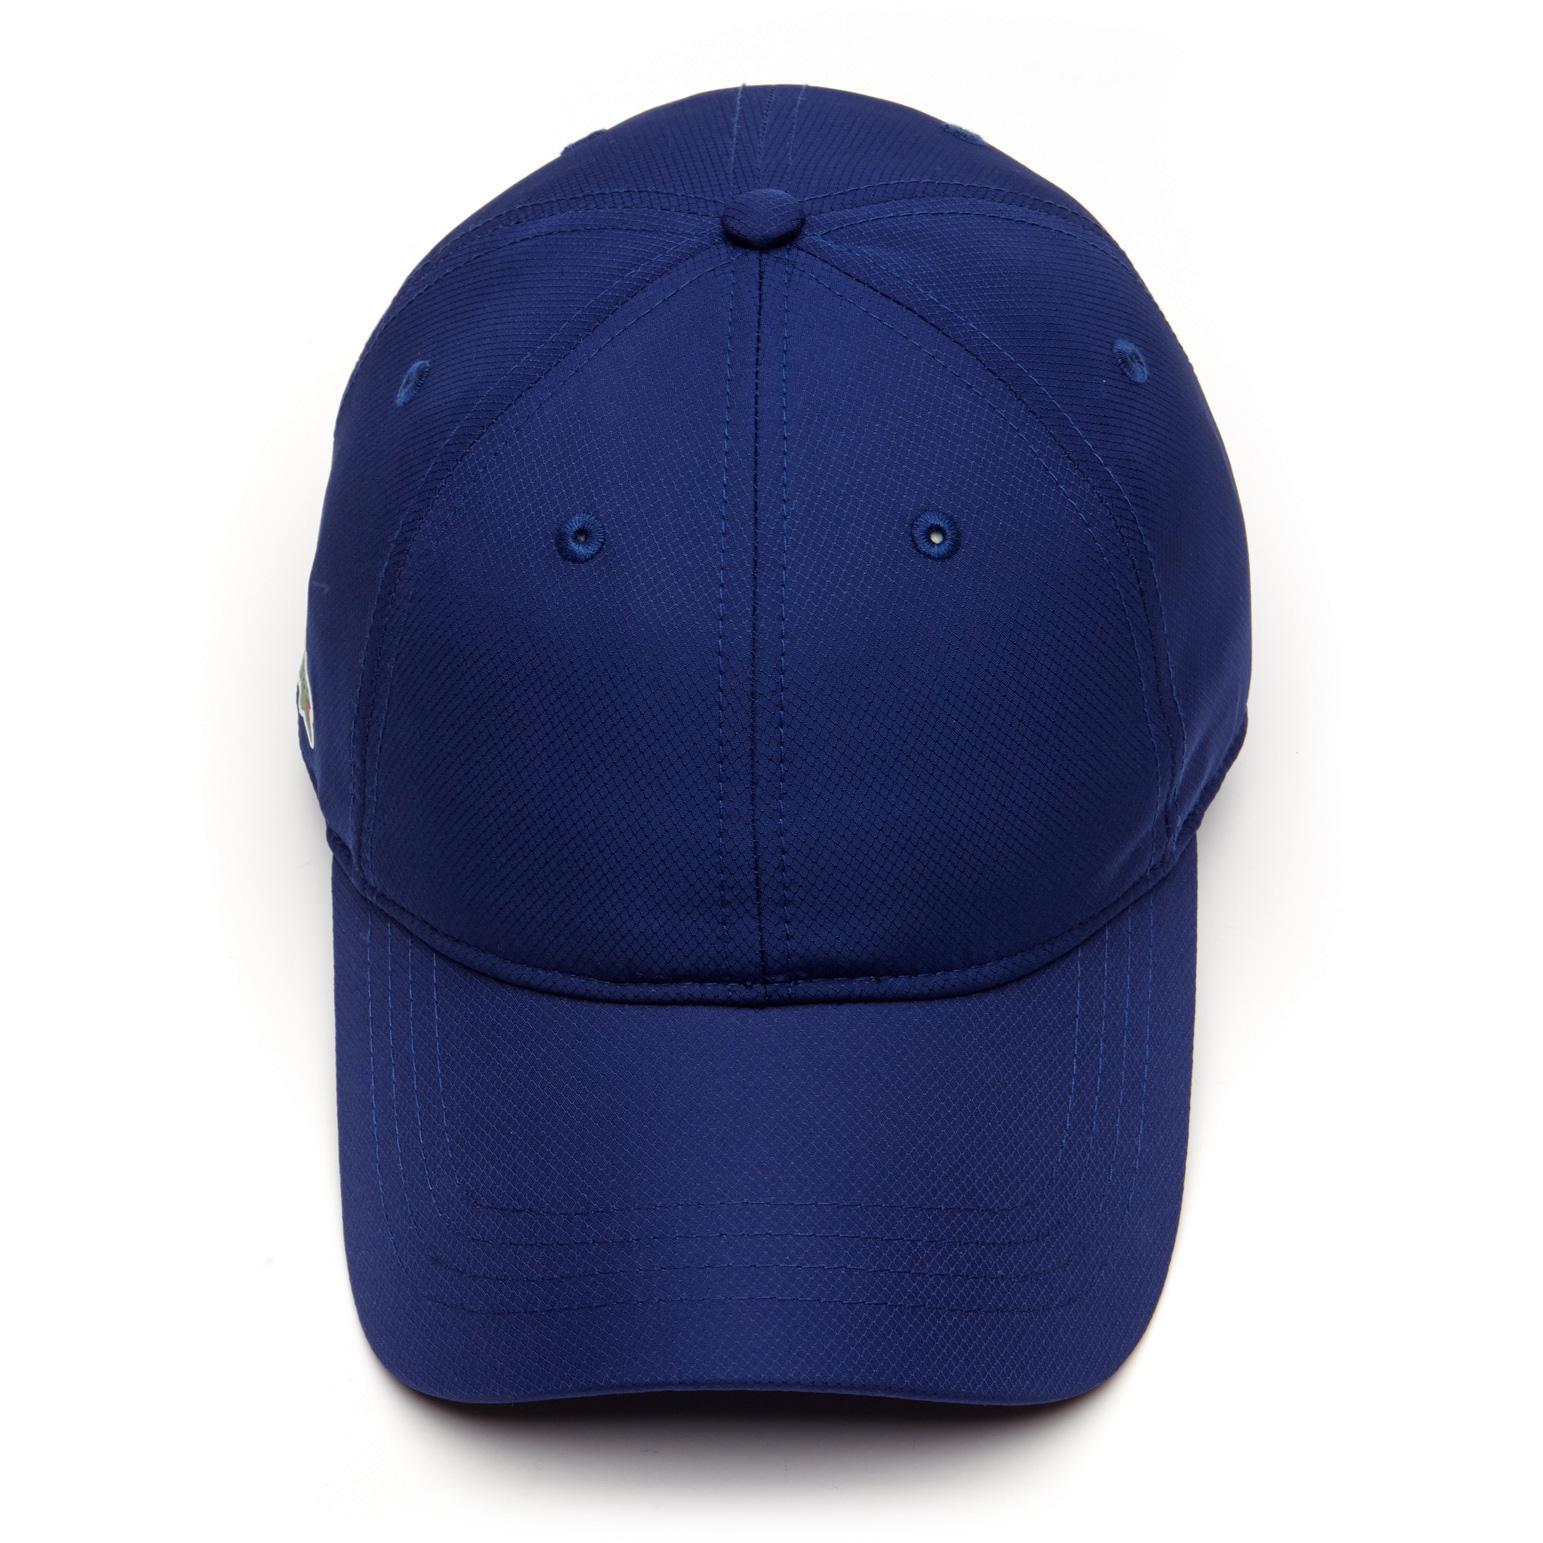 3b496ca004a Lacoste Sport Mens Cap in Solid Diamond Weave Taffeta - Ocean Blue ...